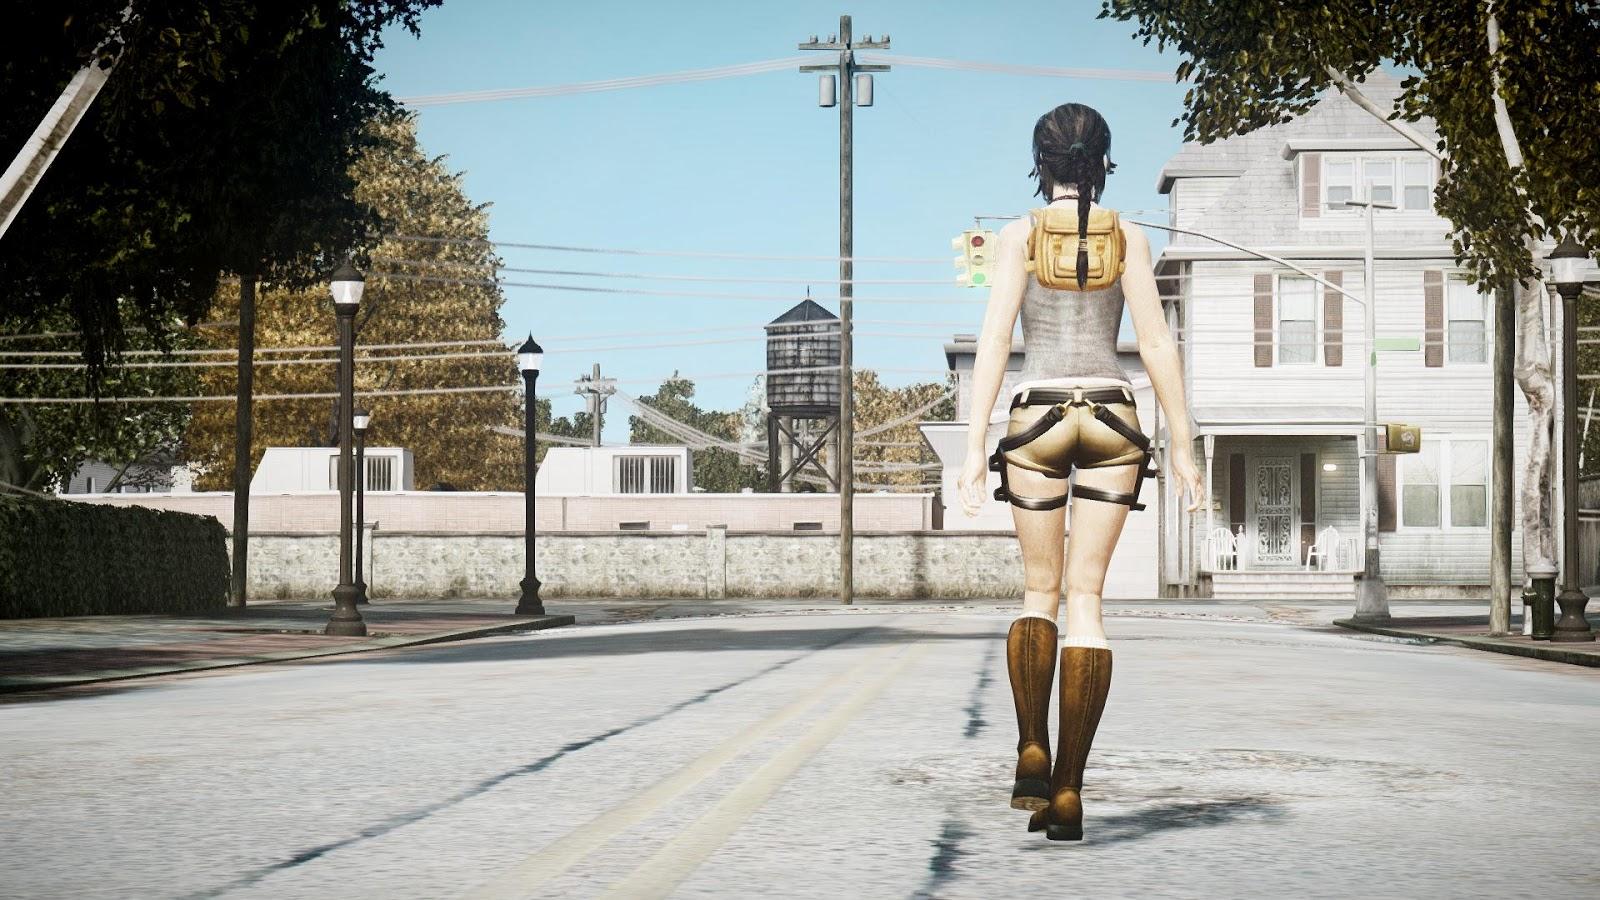 Gta 4 lara croft nude mod ps hentai photos